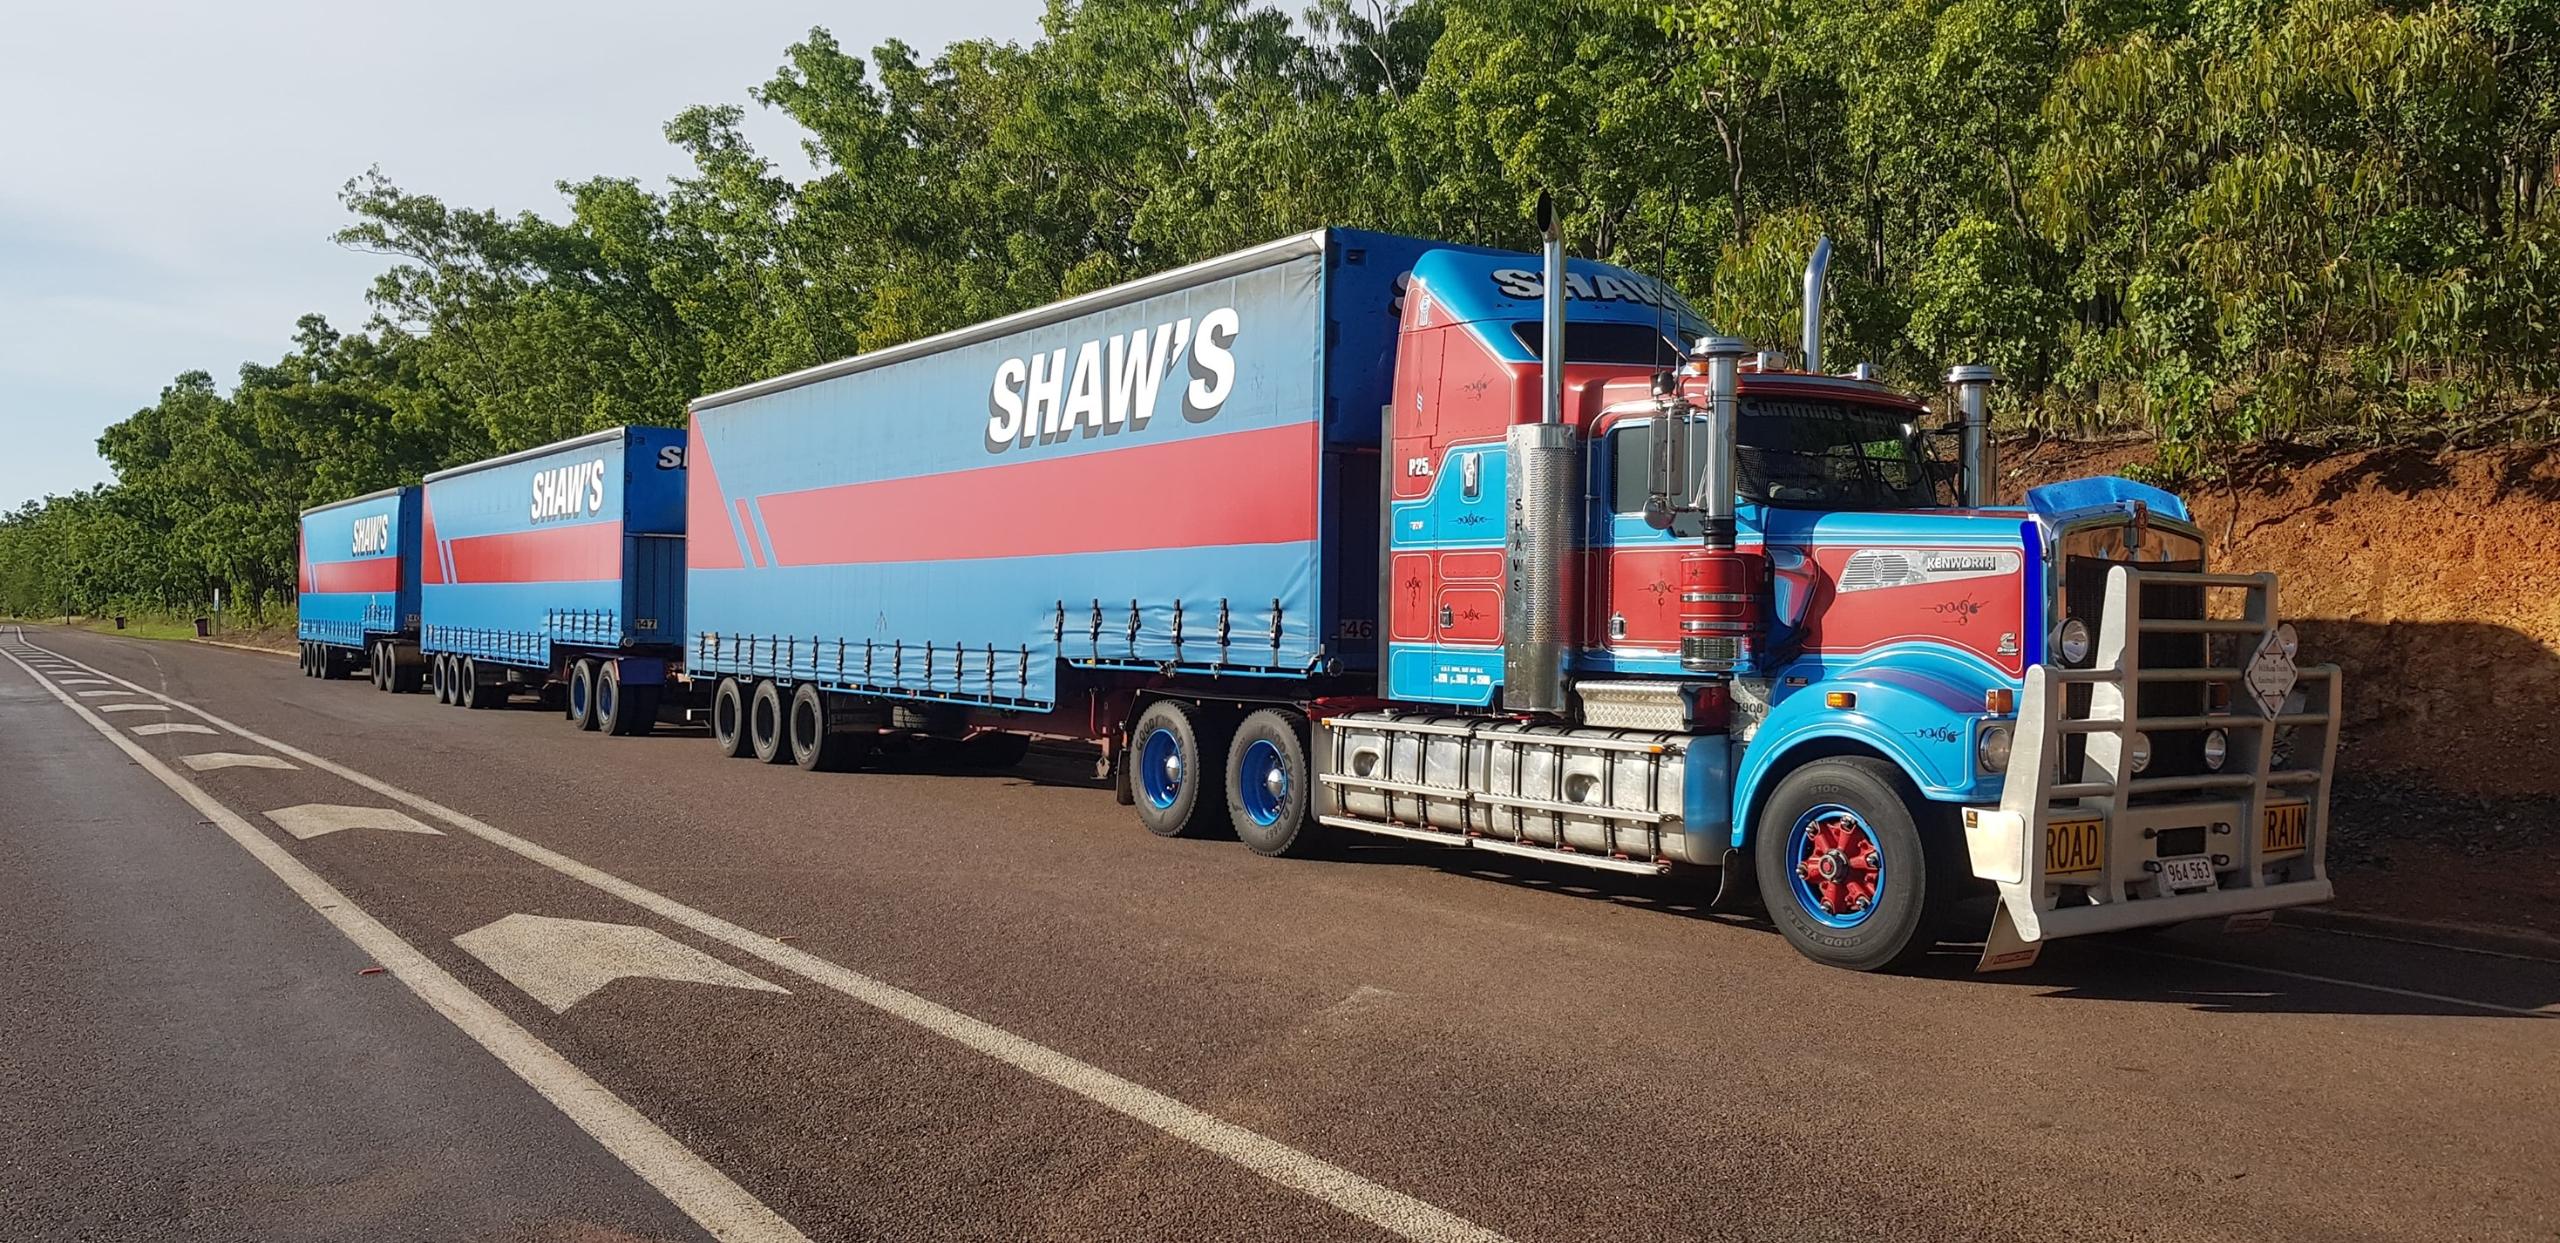 Shaw's Darwin Transport  (@shawsdarwintransport) Cover Image